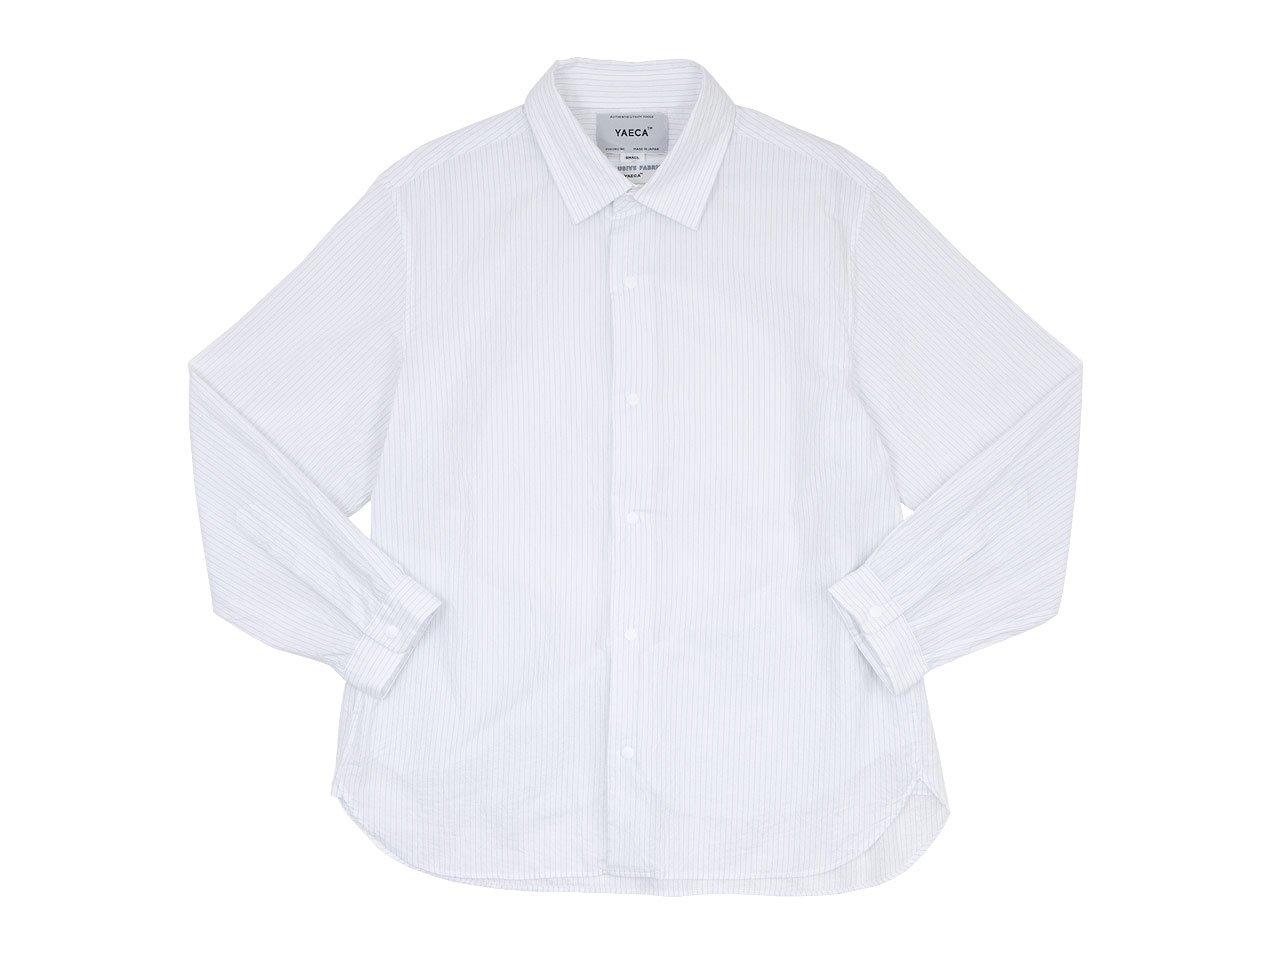 YAECA コンフォートシャツ ワイド BLUE STRIPE 〔レディース〕